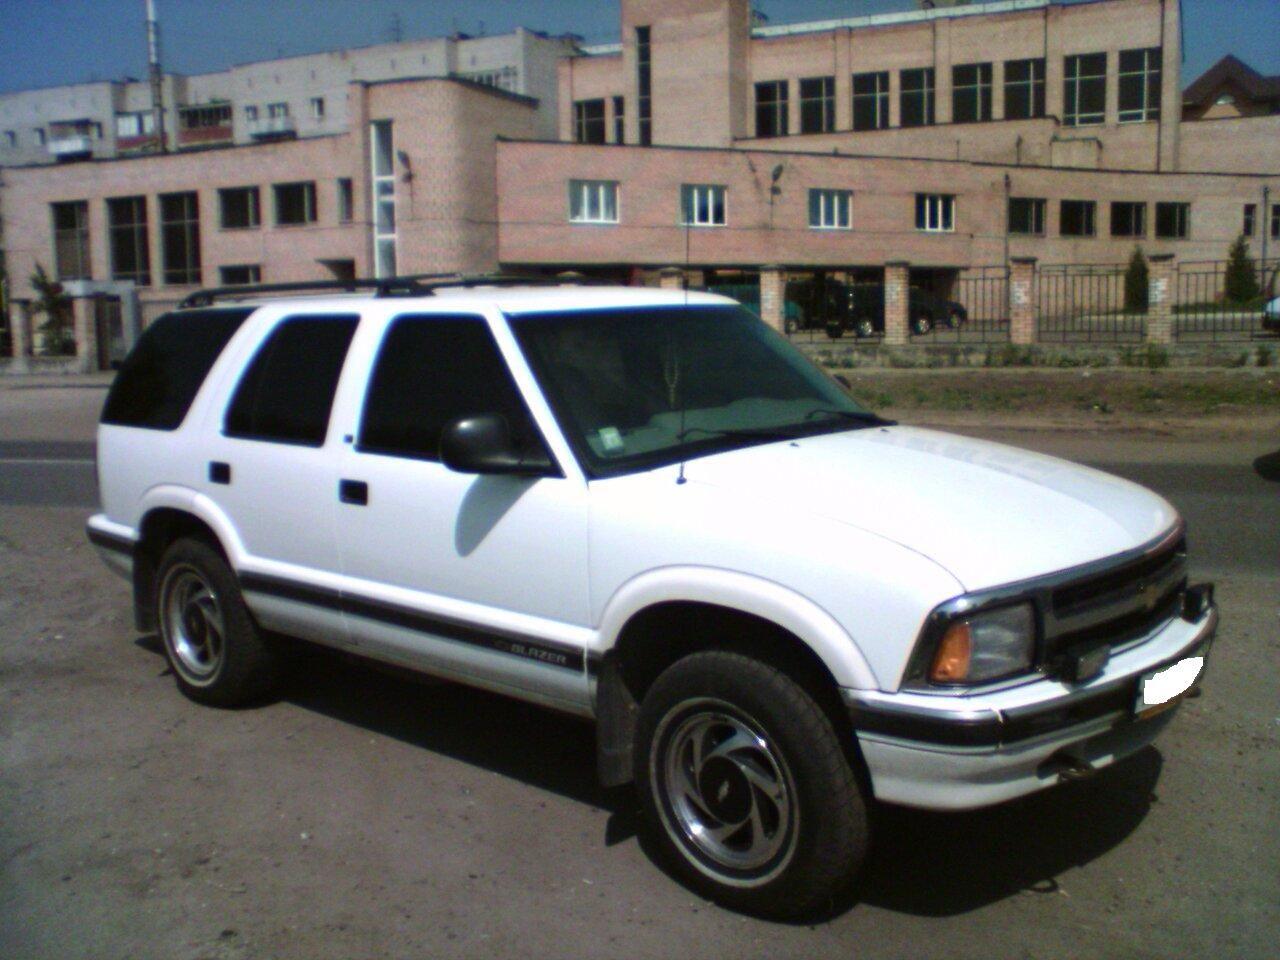 1996 Chevrolet Blazer For Sale, 4.3, Gasoline, Automatic For Sale